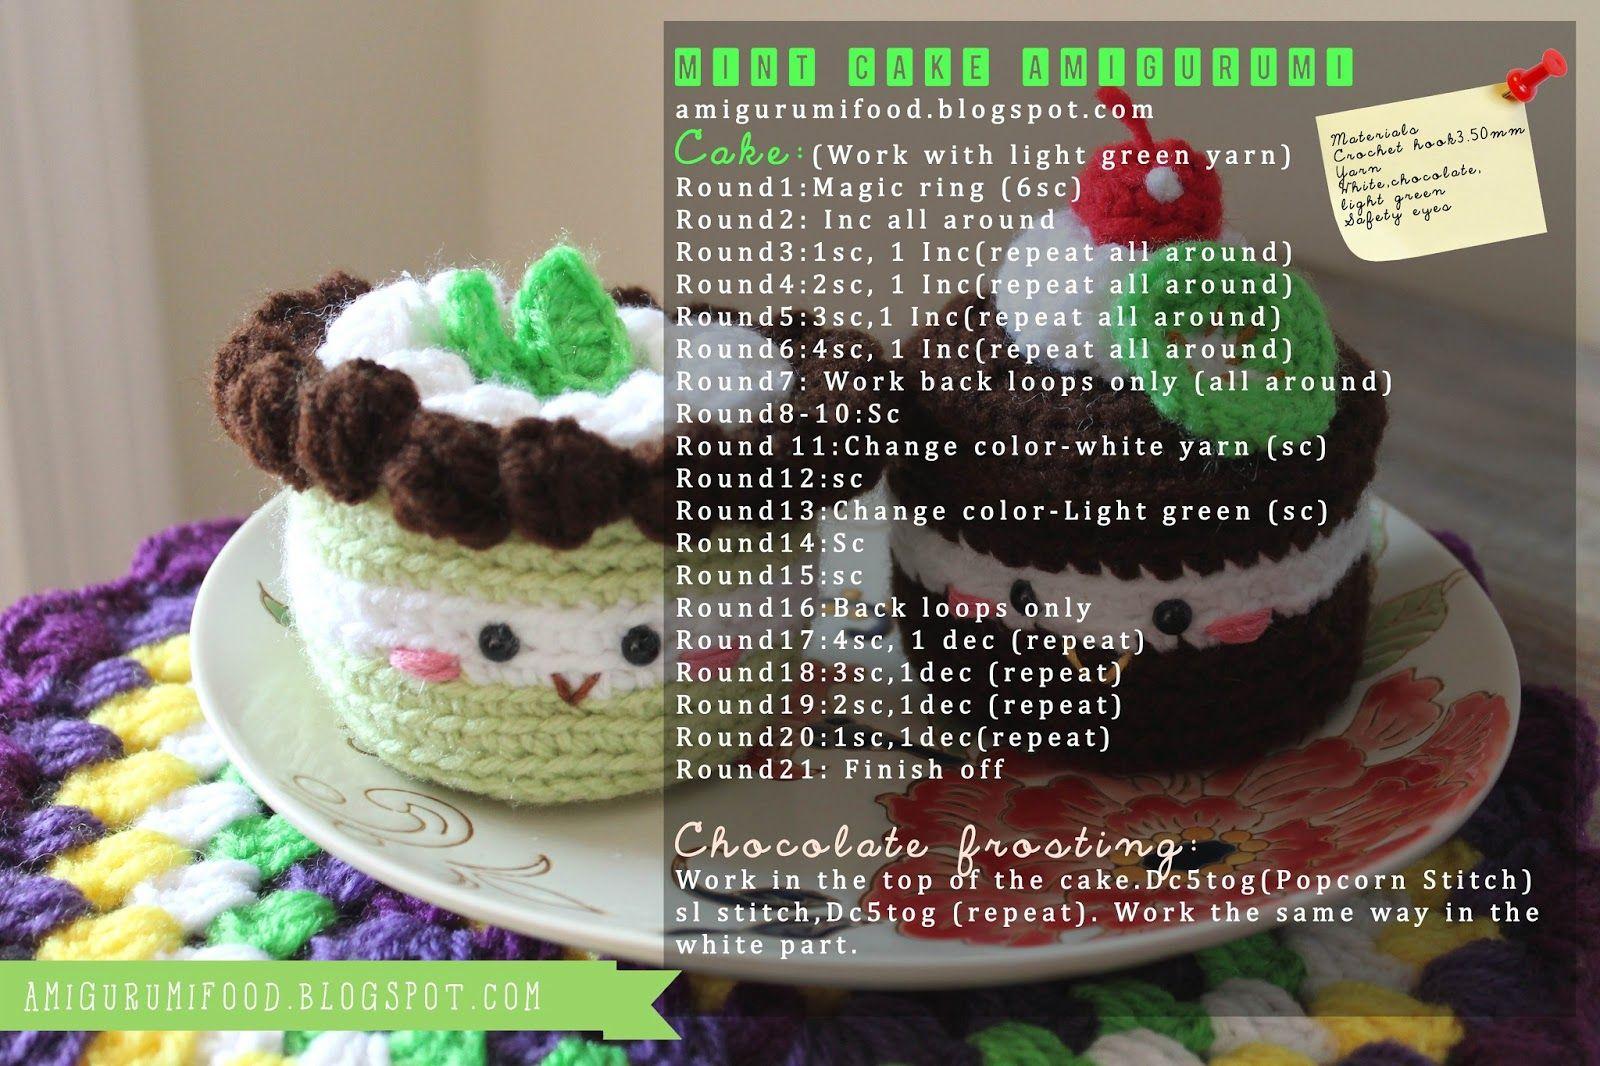 Amigurumi food mint cake amigurumi free pattern knitcrochet amigurumi food mint cake amigurumi free pattern bankloansurffo Choice Image